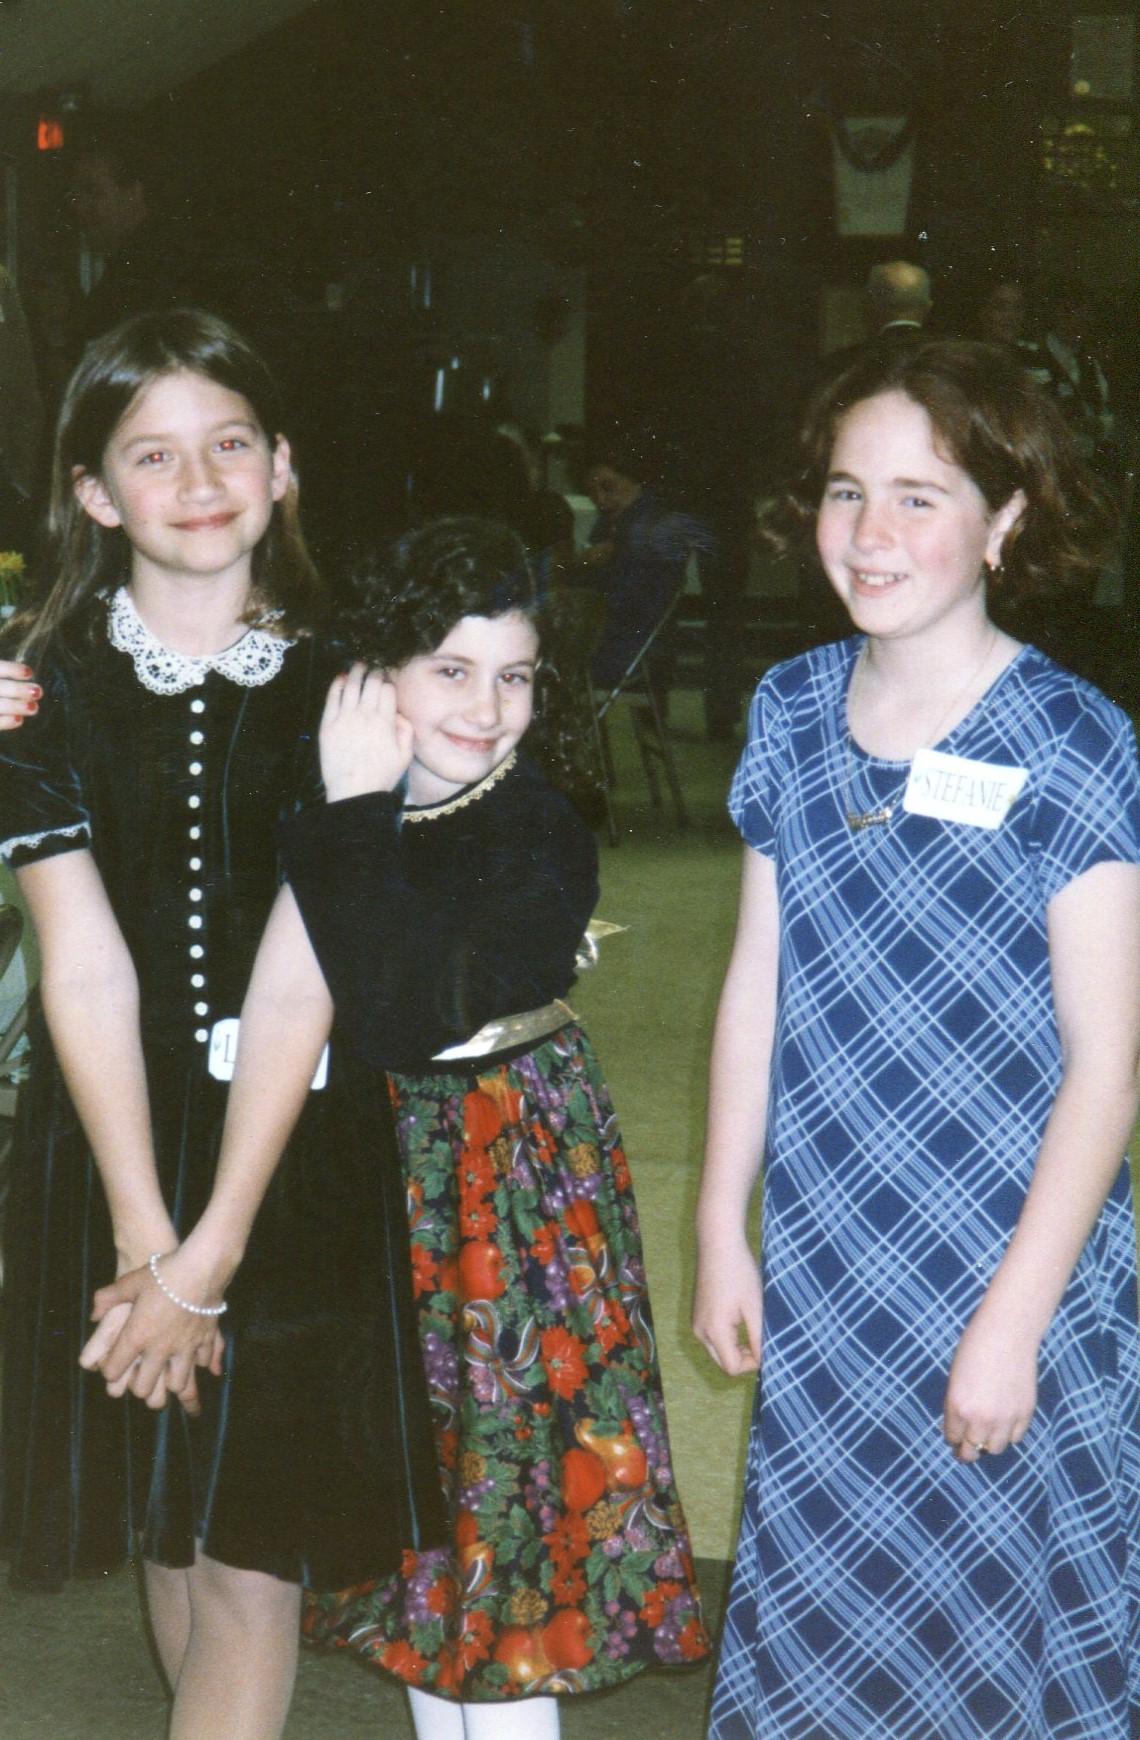 with cousins Lizzie and Stefanie